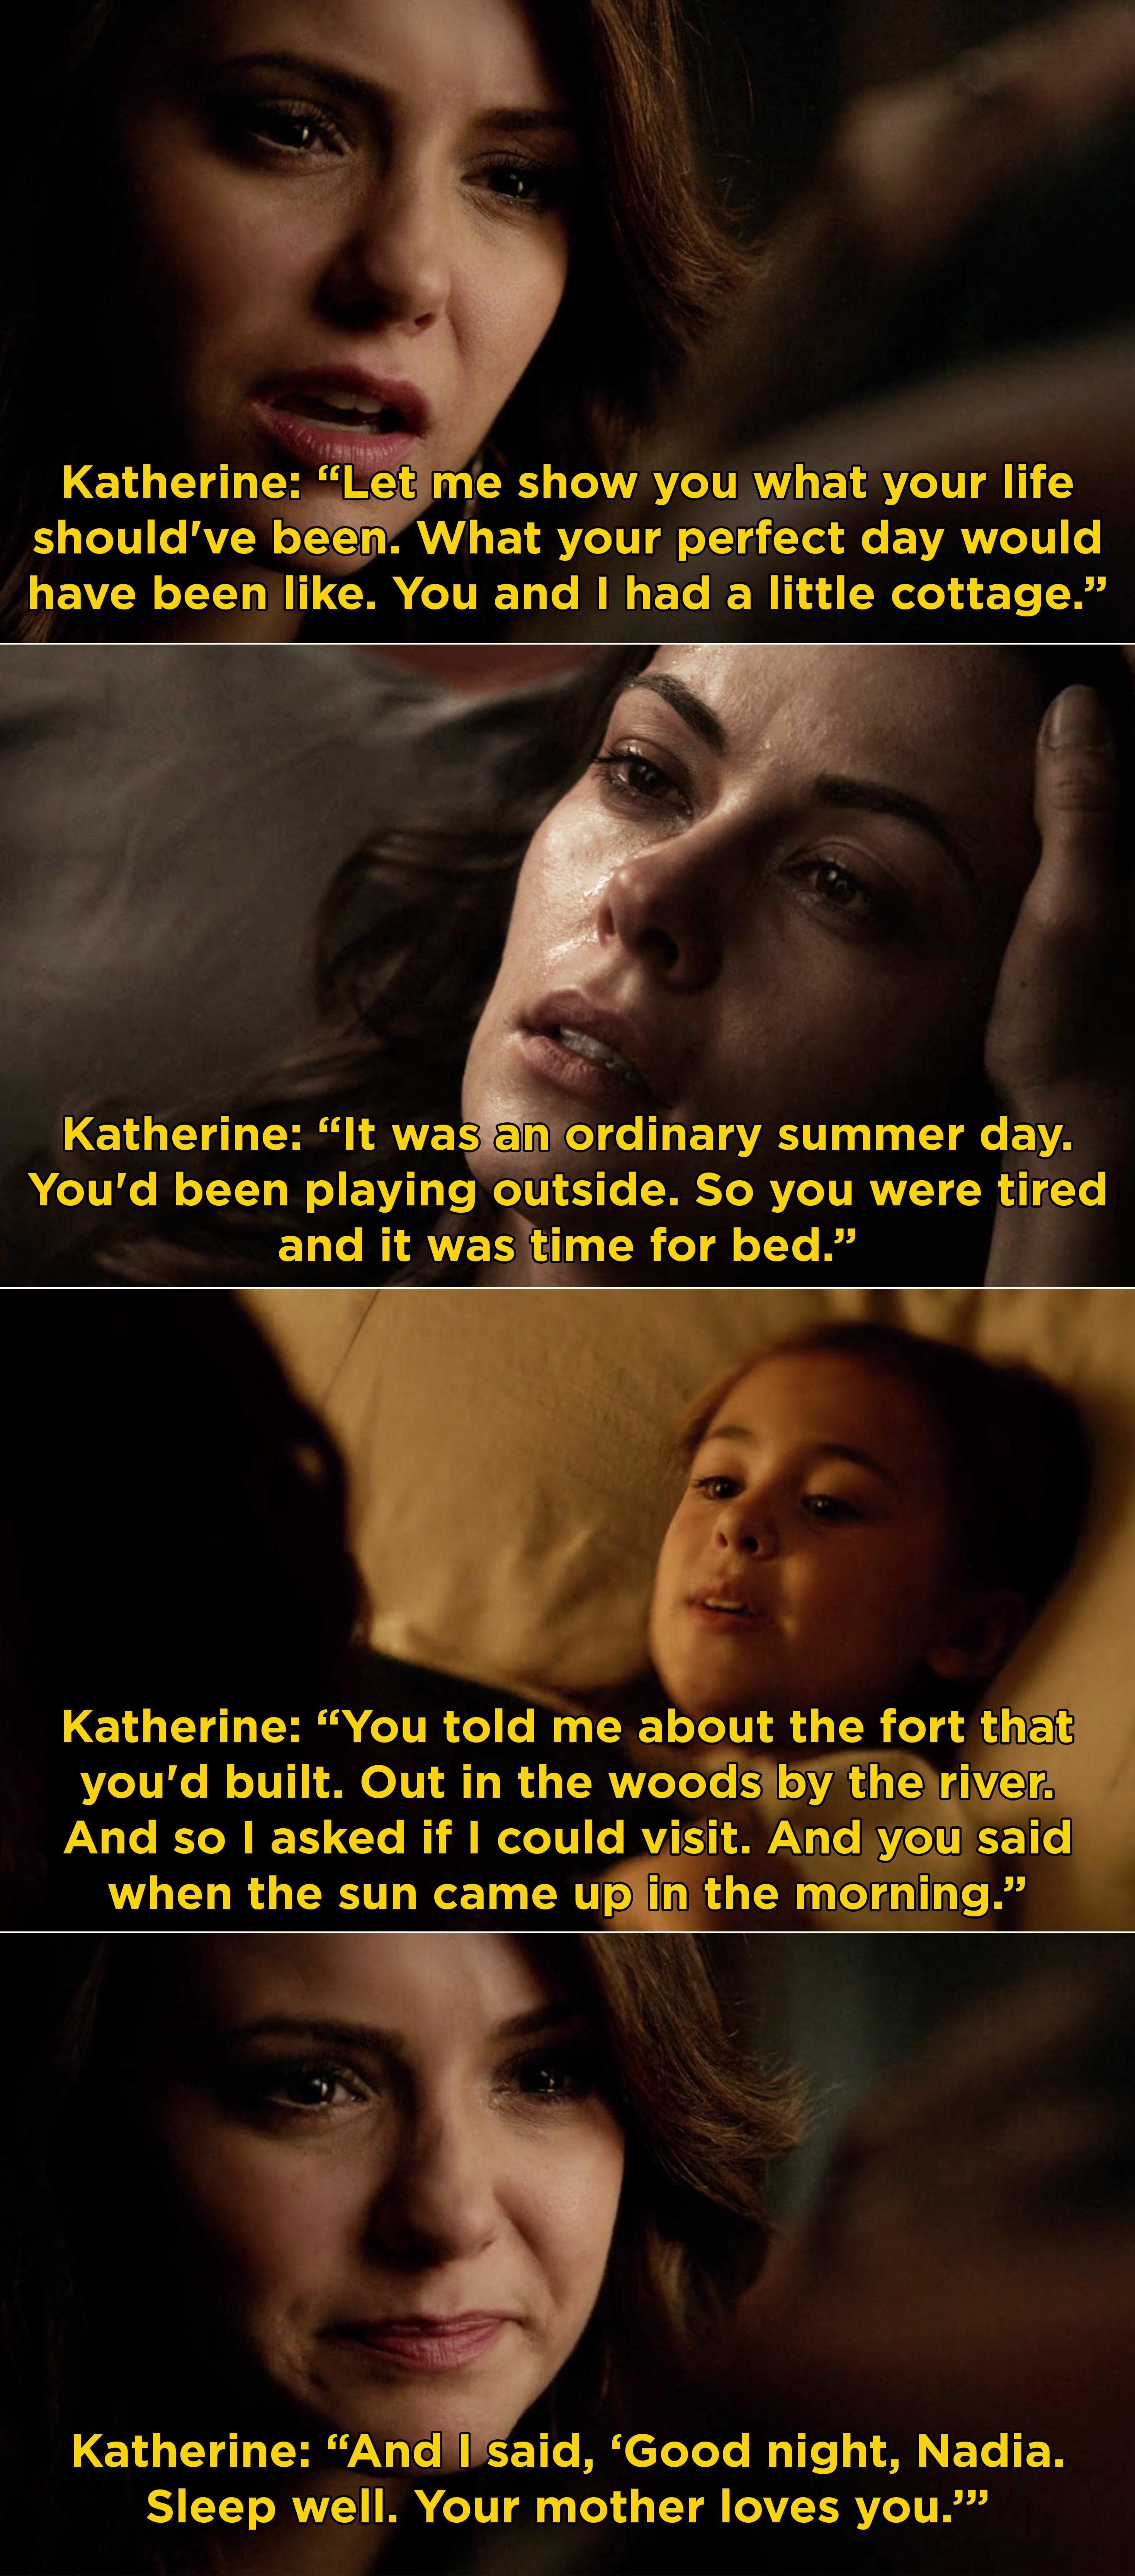 Katherine comforting Nadia before she dies